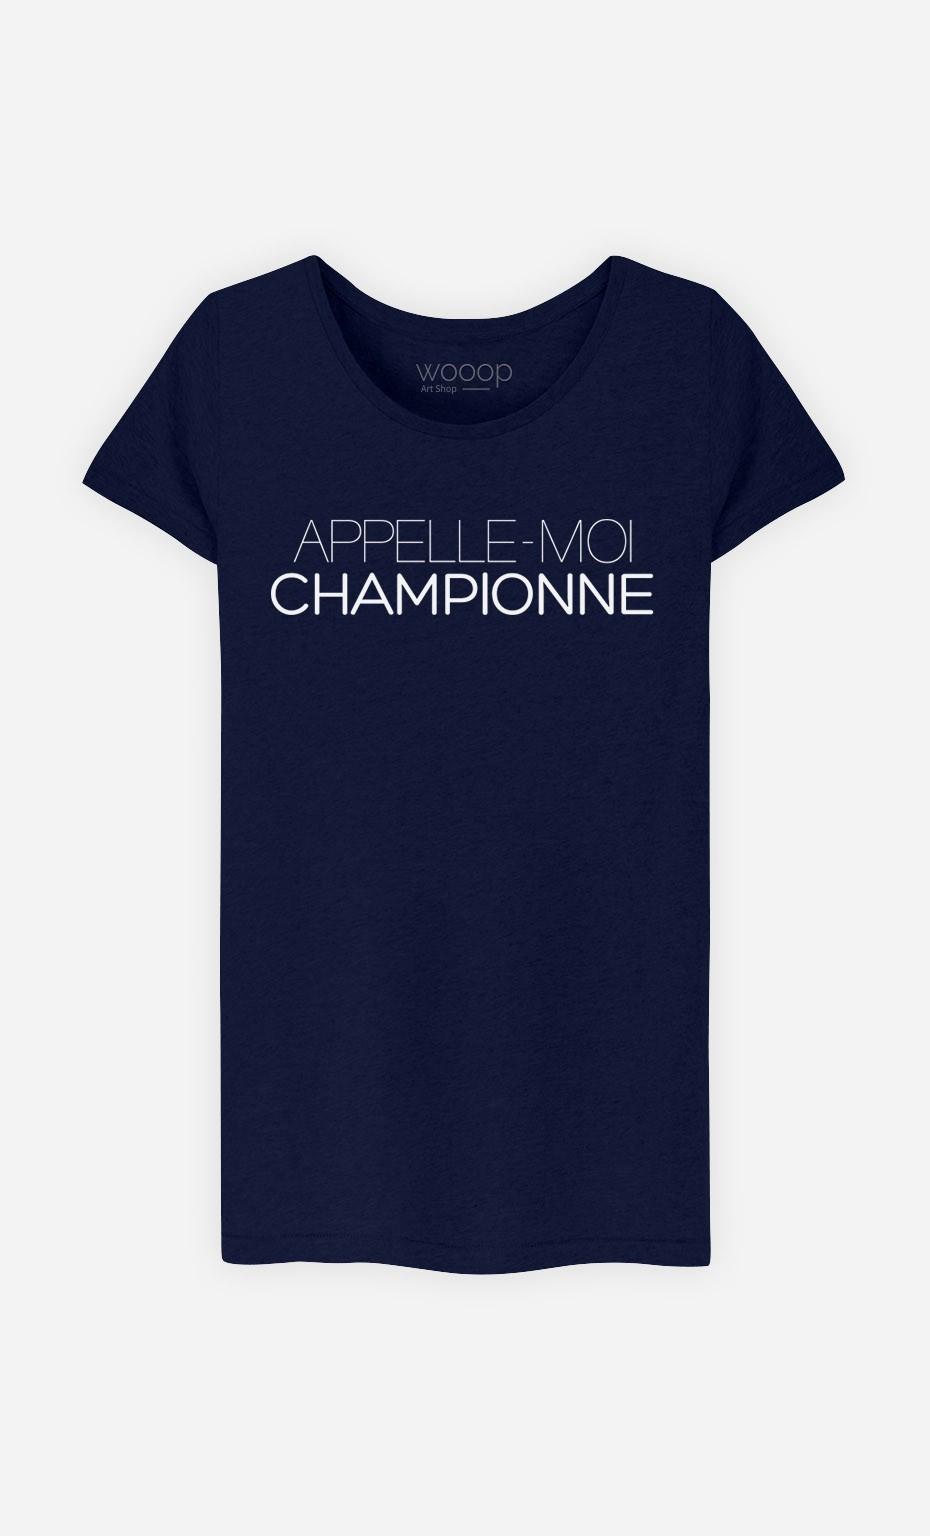 T-Shirt Appelle-Moi Championne